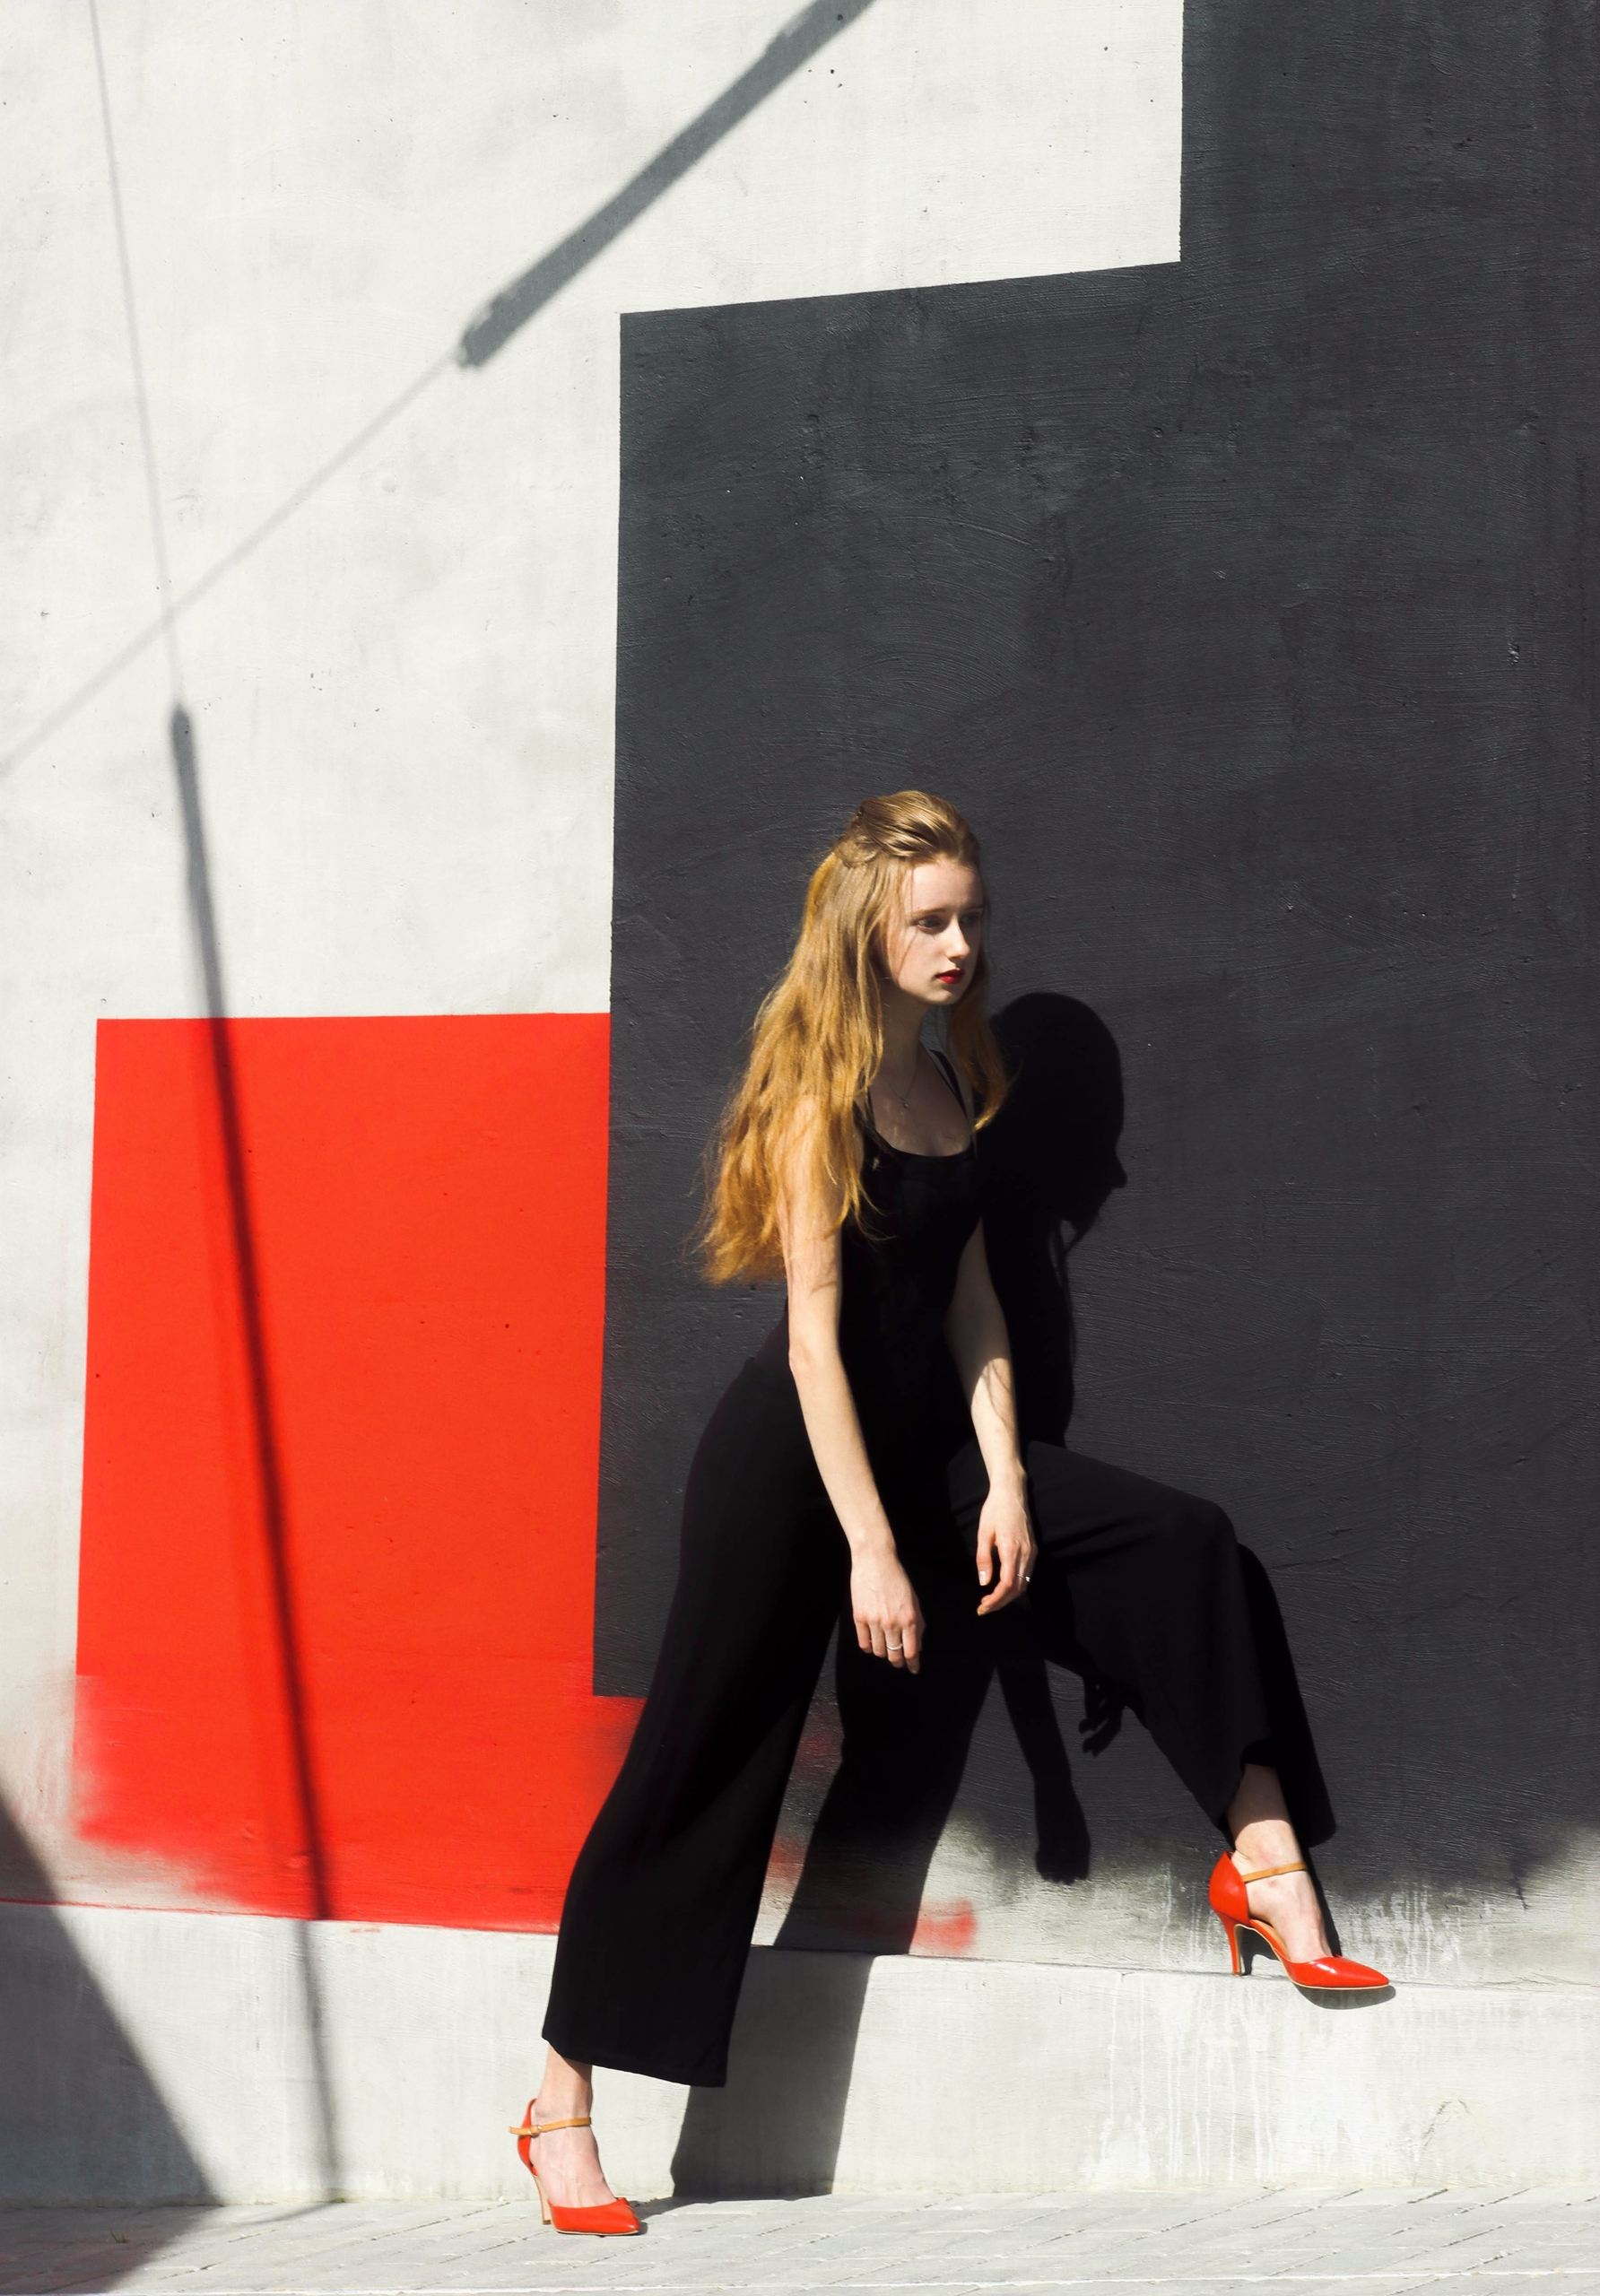 COMPOSITION 2017 - line, color, red - svitlanayershova   ello